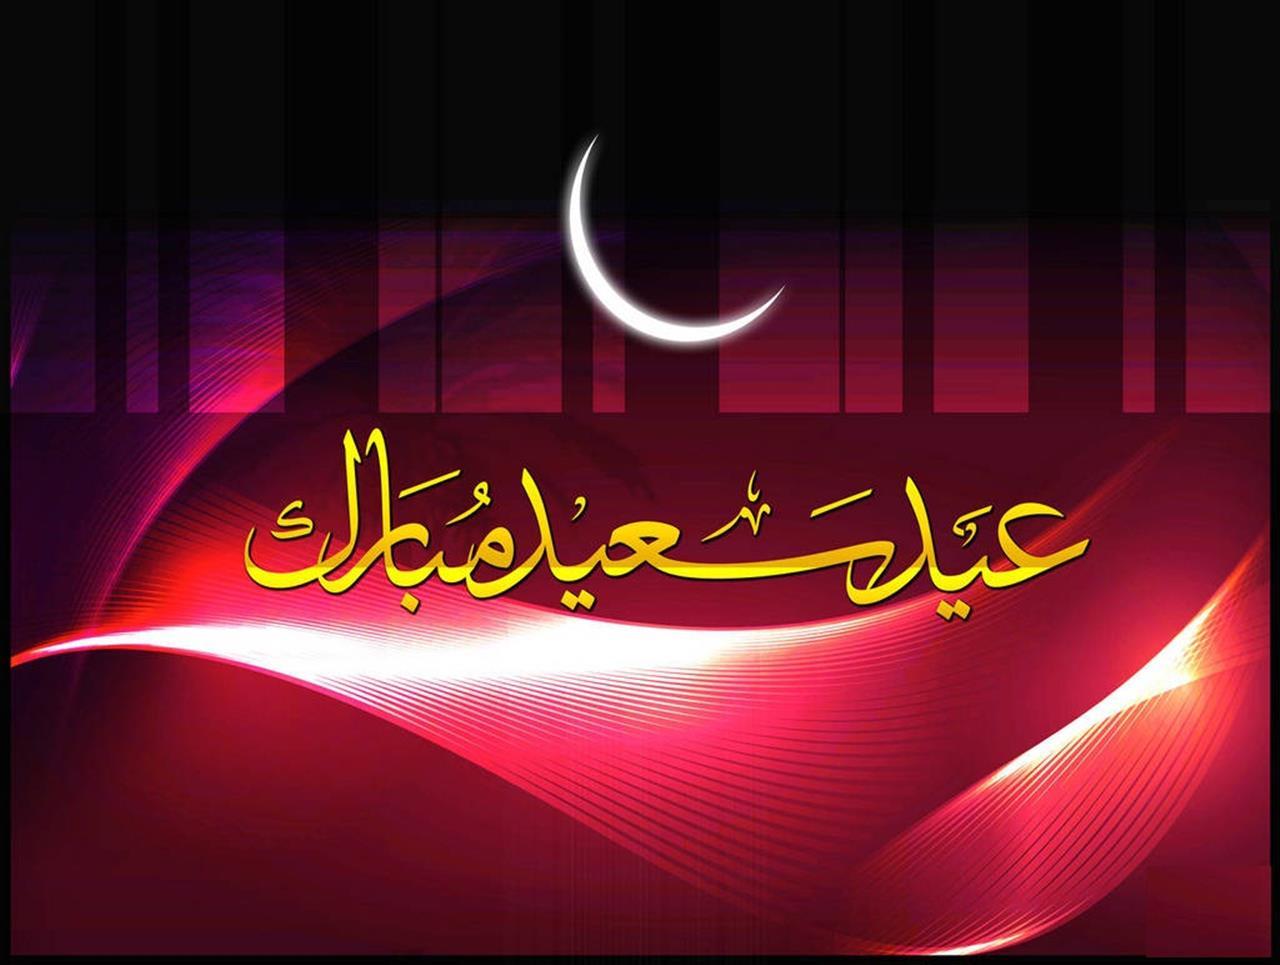 Quots In Urdu Wallpaper Happy Eid Ul Adha Wallpapers New Greeting Cards 2014